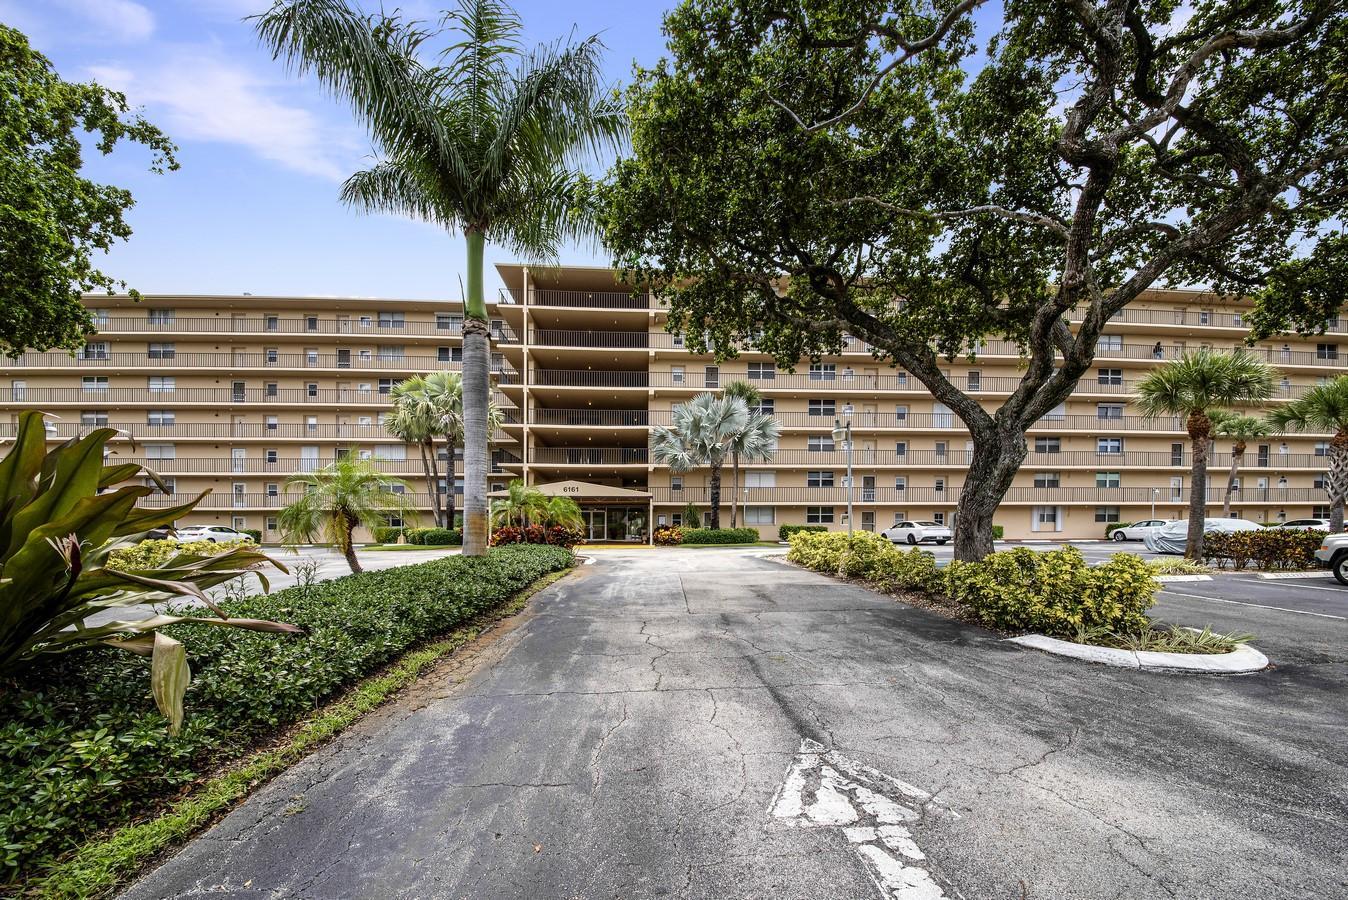 6161 NW 2nd Avenue 422  Boca Raton, FL 33487